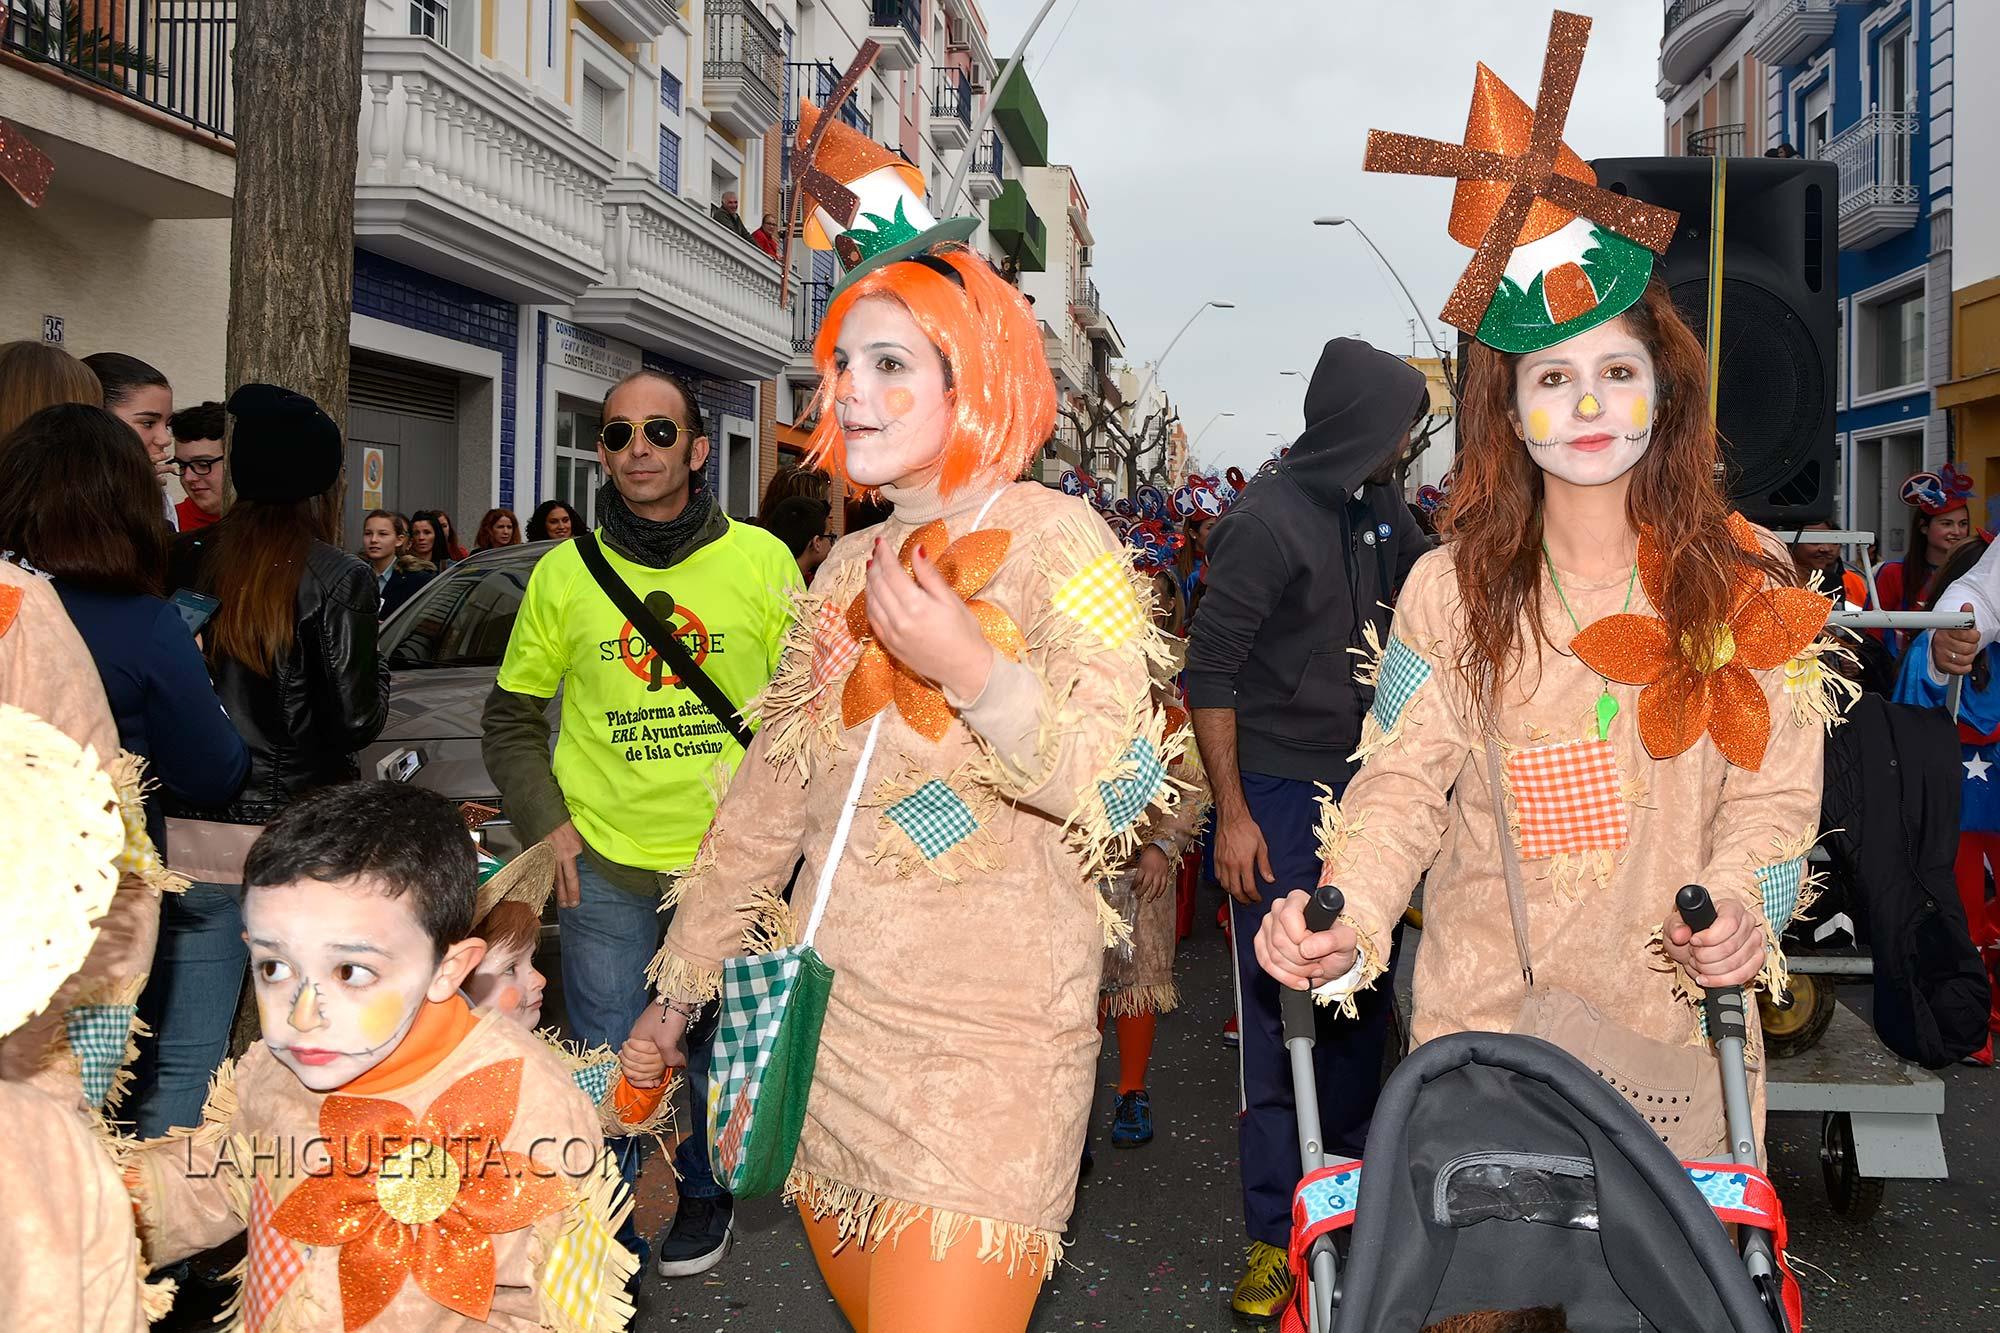 Cabalgata infantil carnaval isla cristina _DSC8314